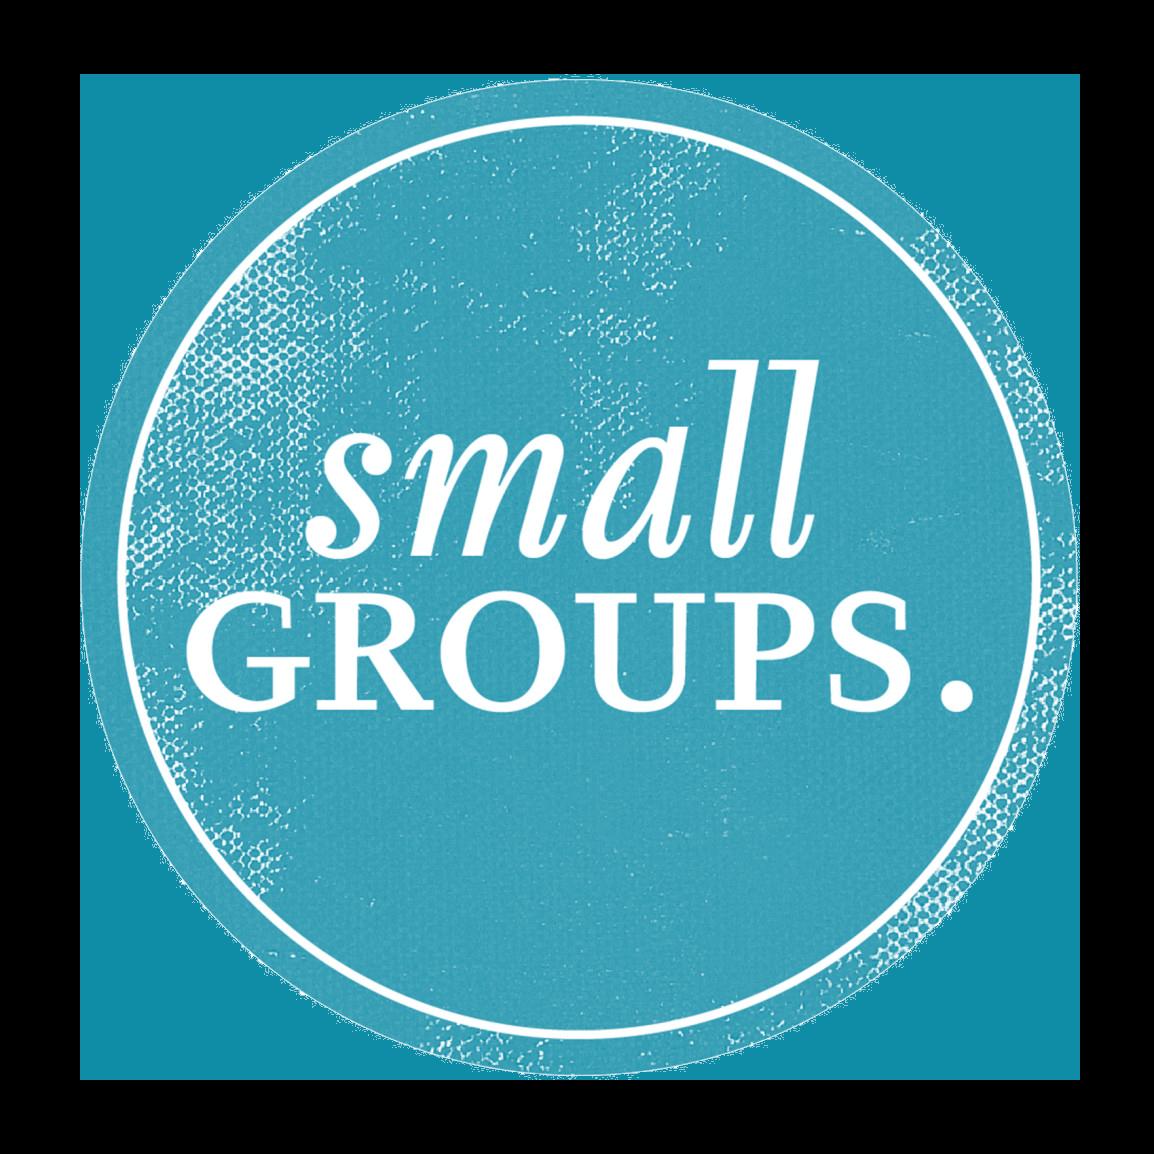 https://www.oportosensationstour.com/wp-content/uploads/2020/06/smallgroups2-1154x1154-1.png